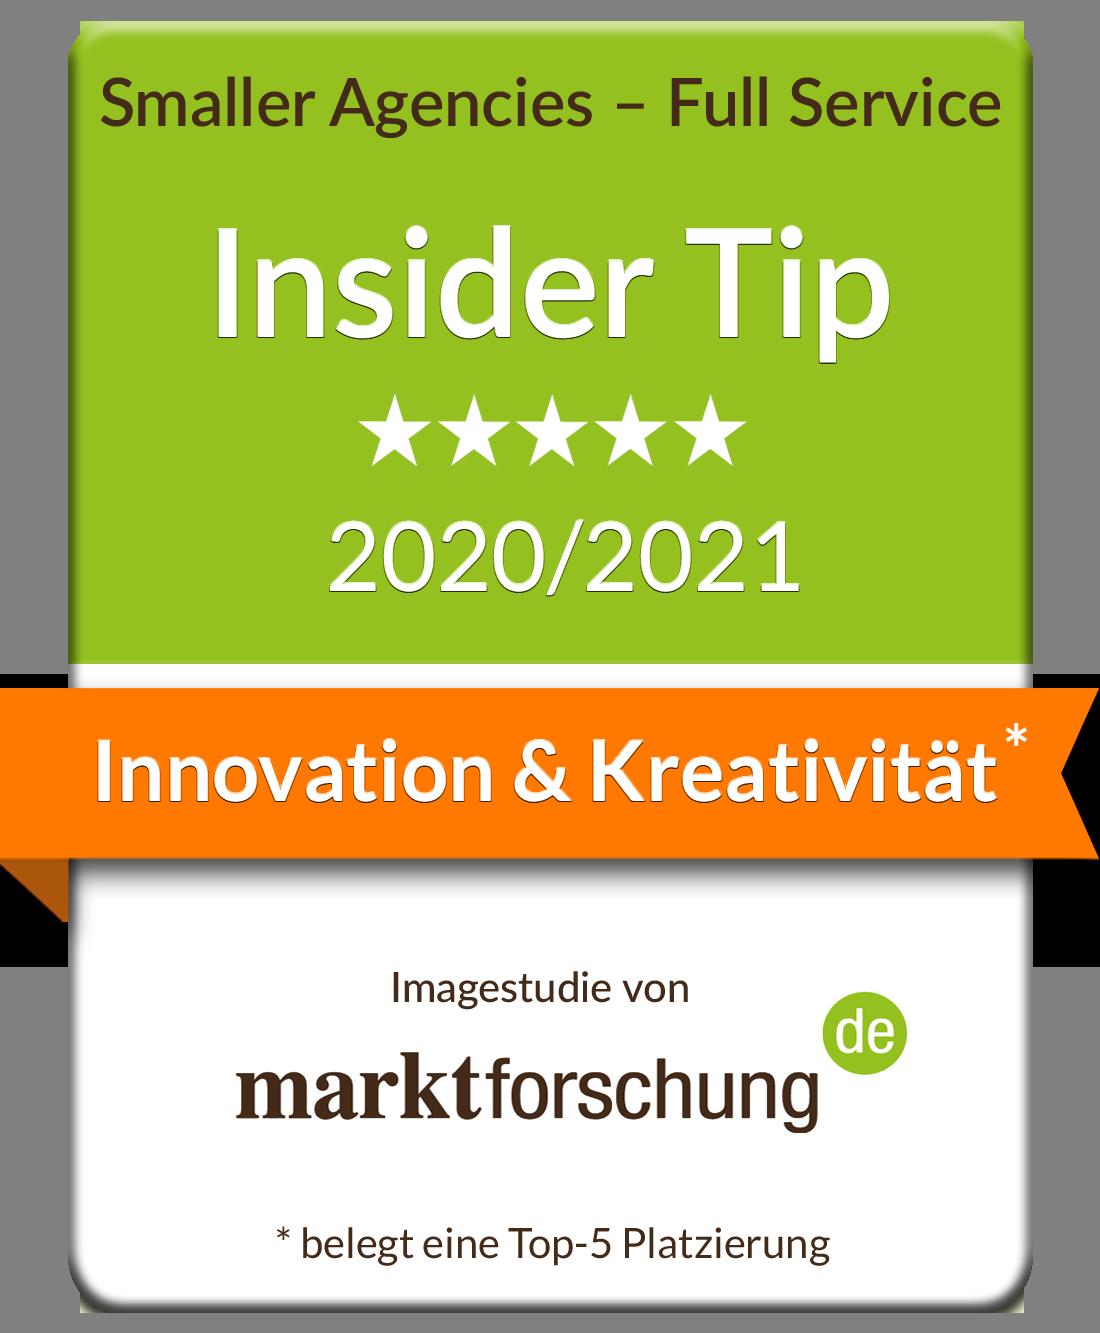 marktforschung.de Innovation & Kreativität